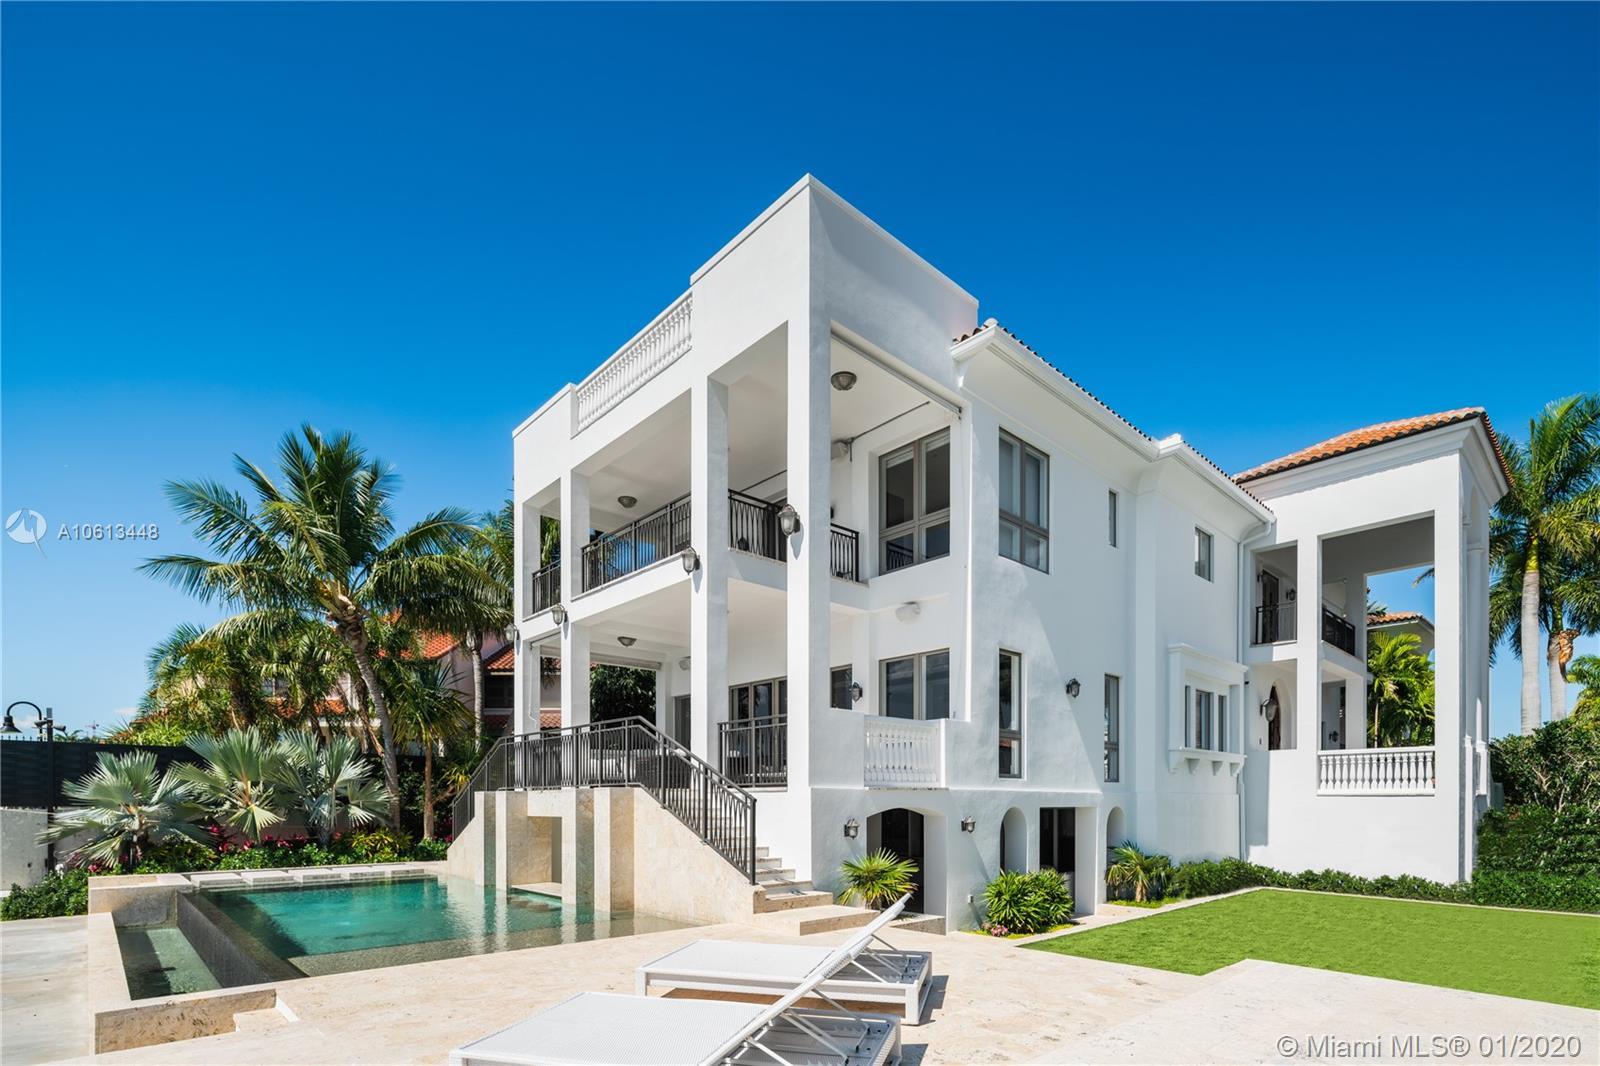 3590 Crystal View Ct, Miami FL 33133